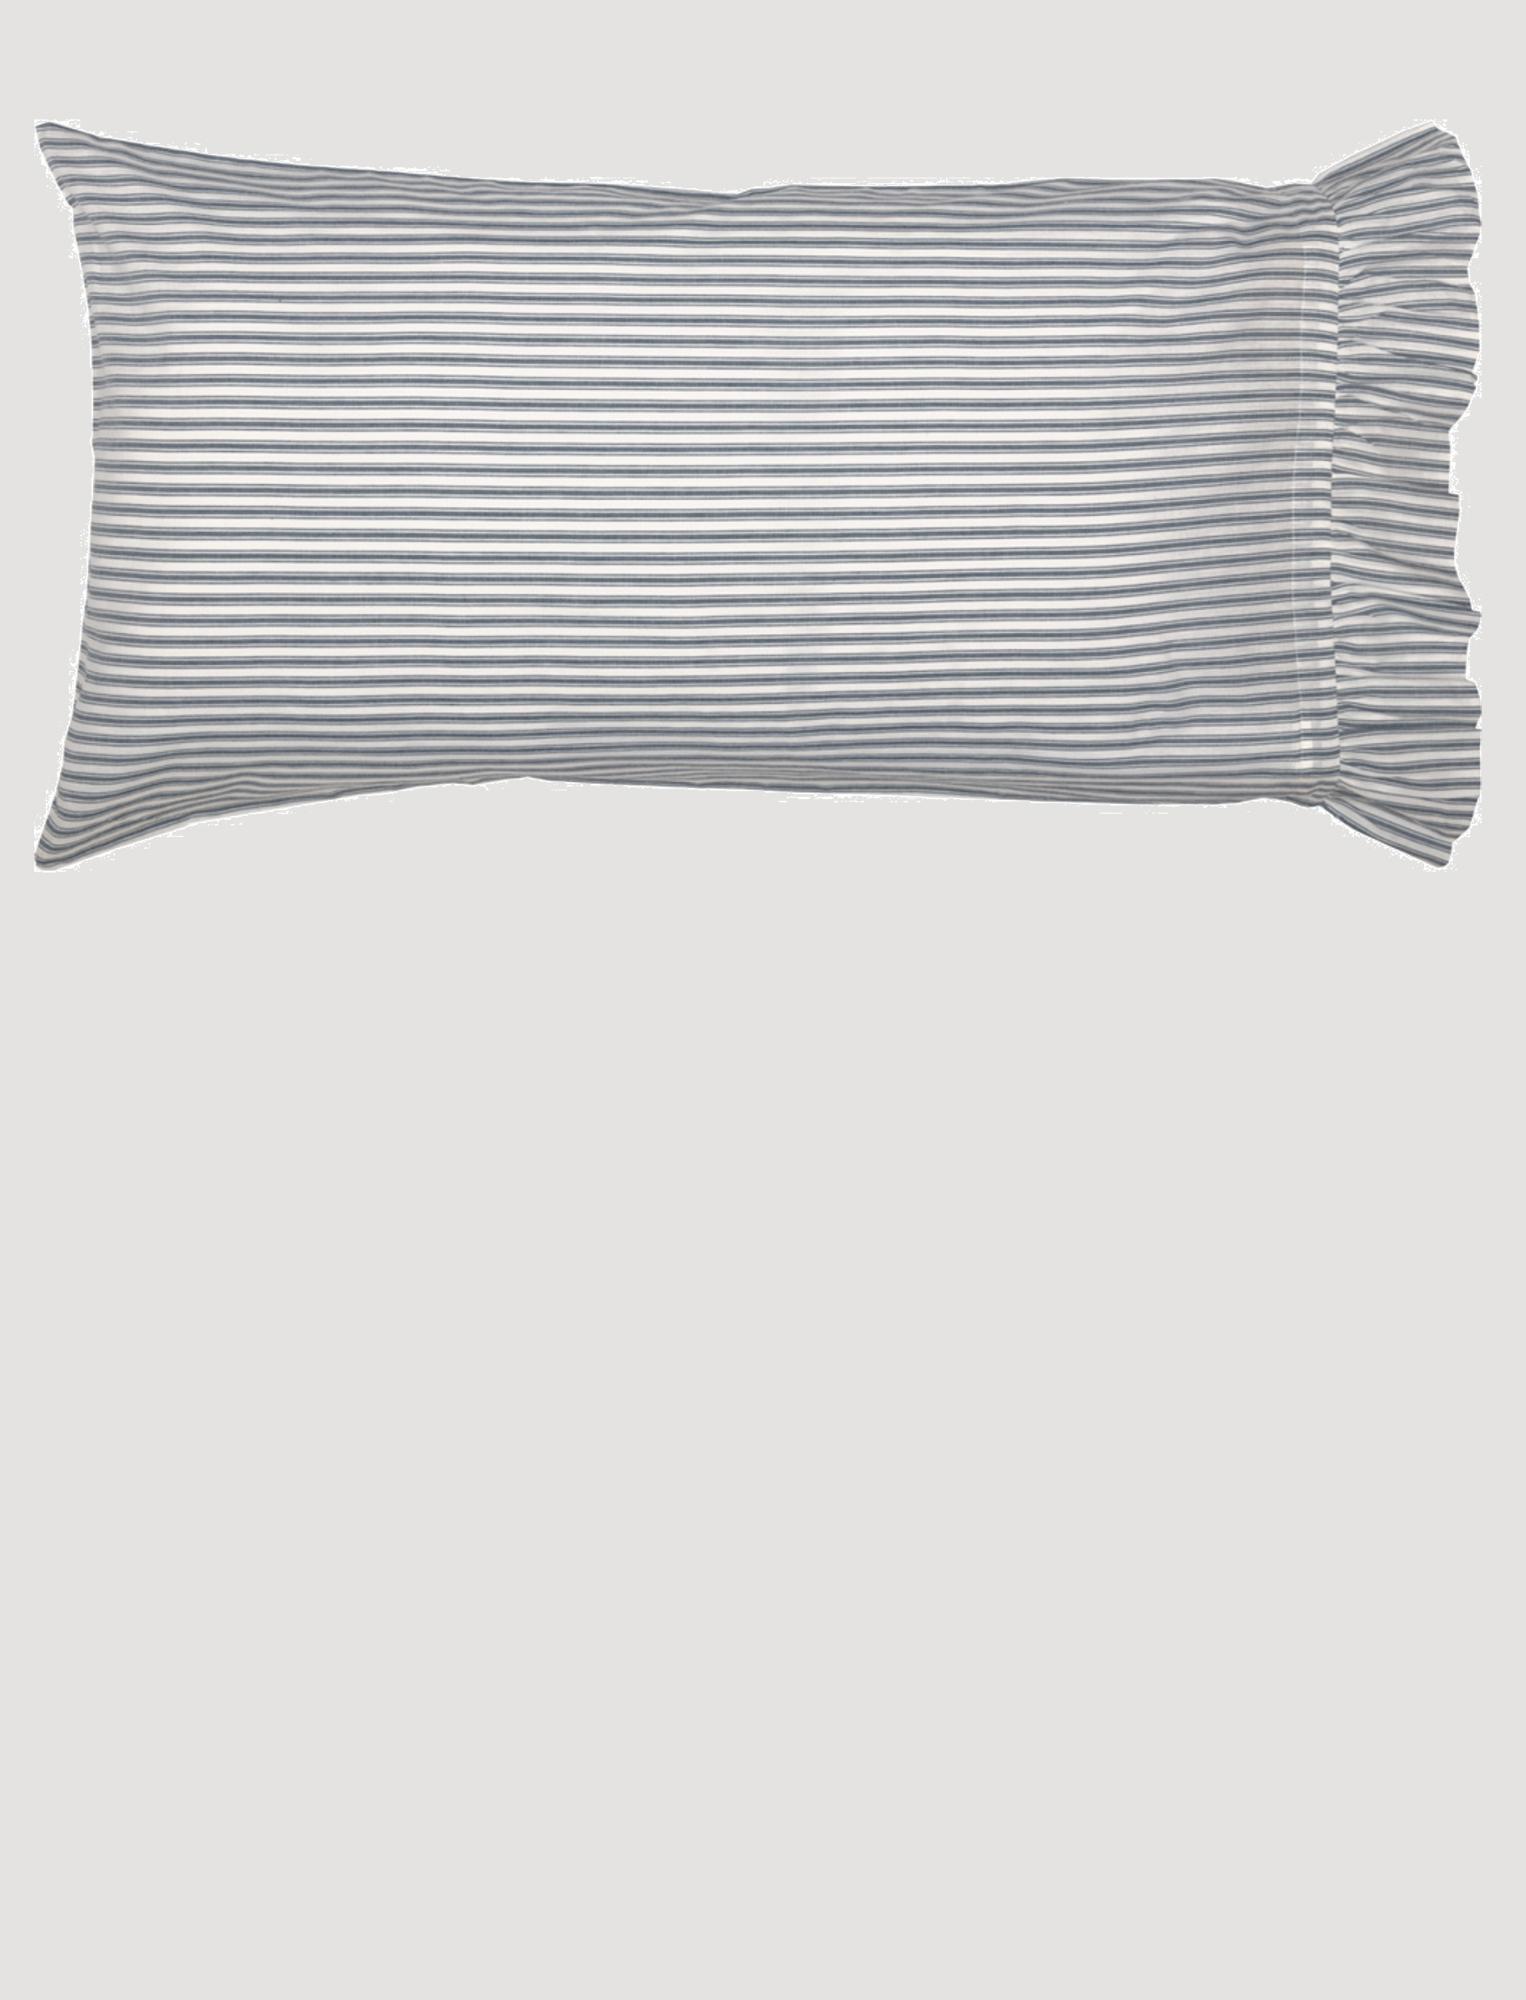 VHC Brands Sawyer Mill Blue Ticking Stripe Pillow Case Set of 2